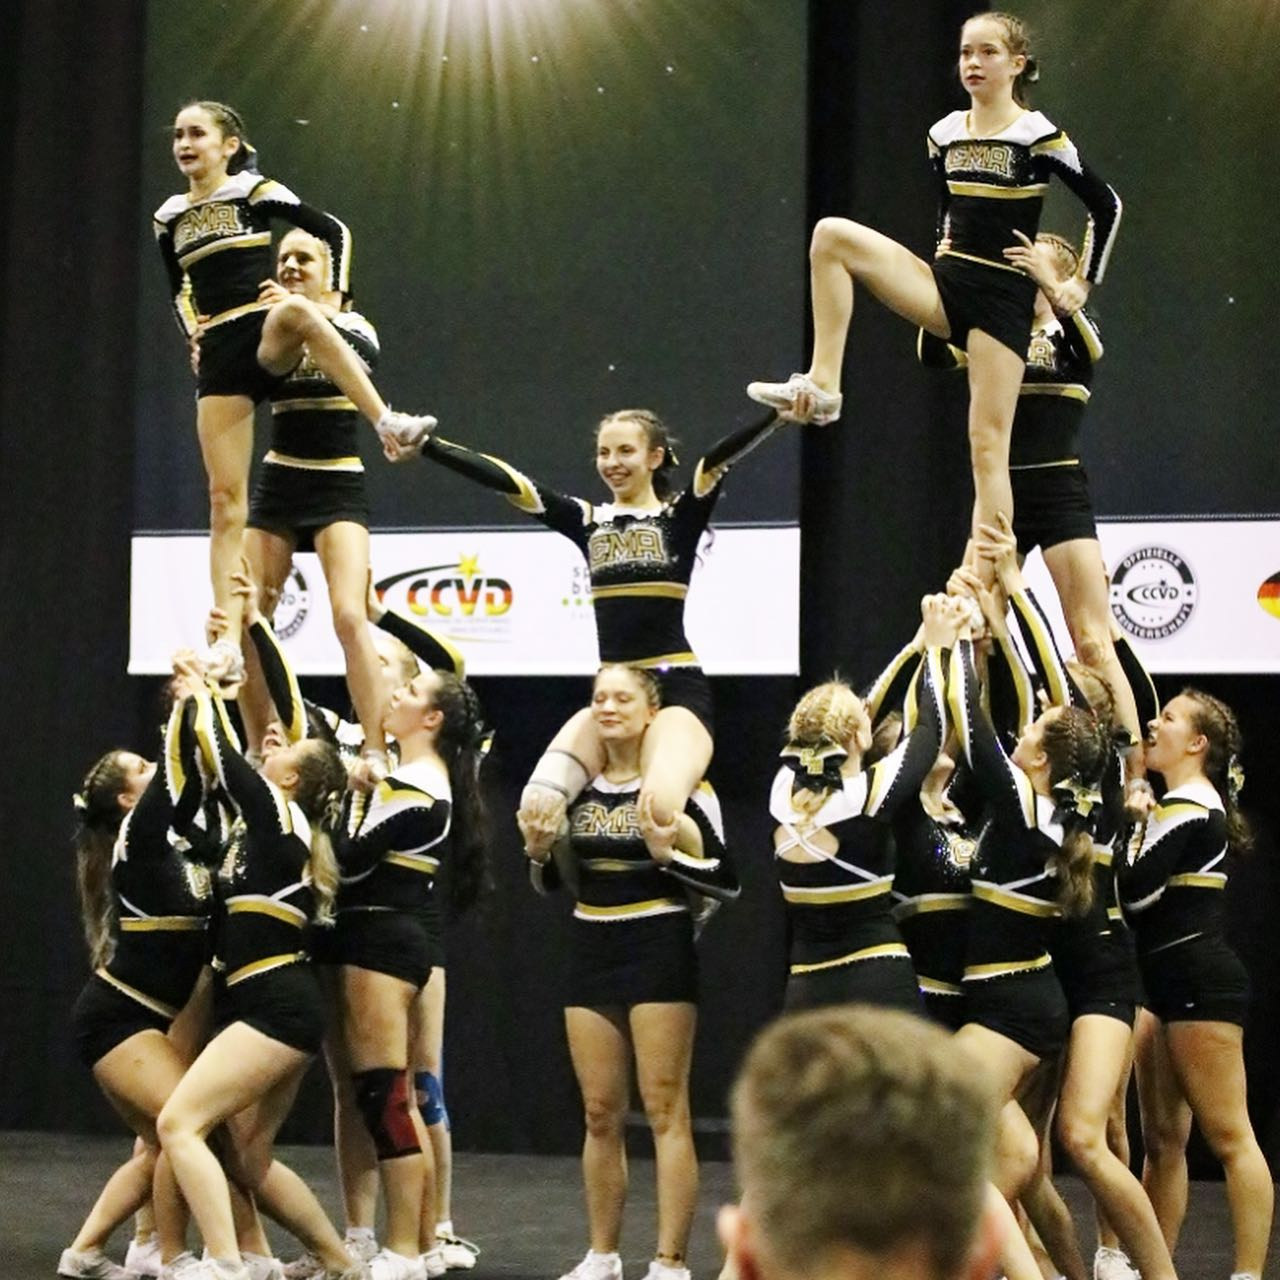 lustige cheerleader momente